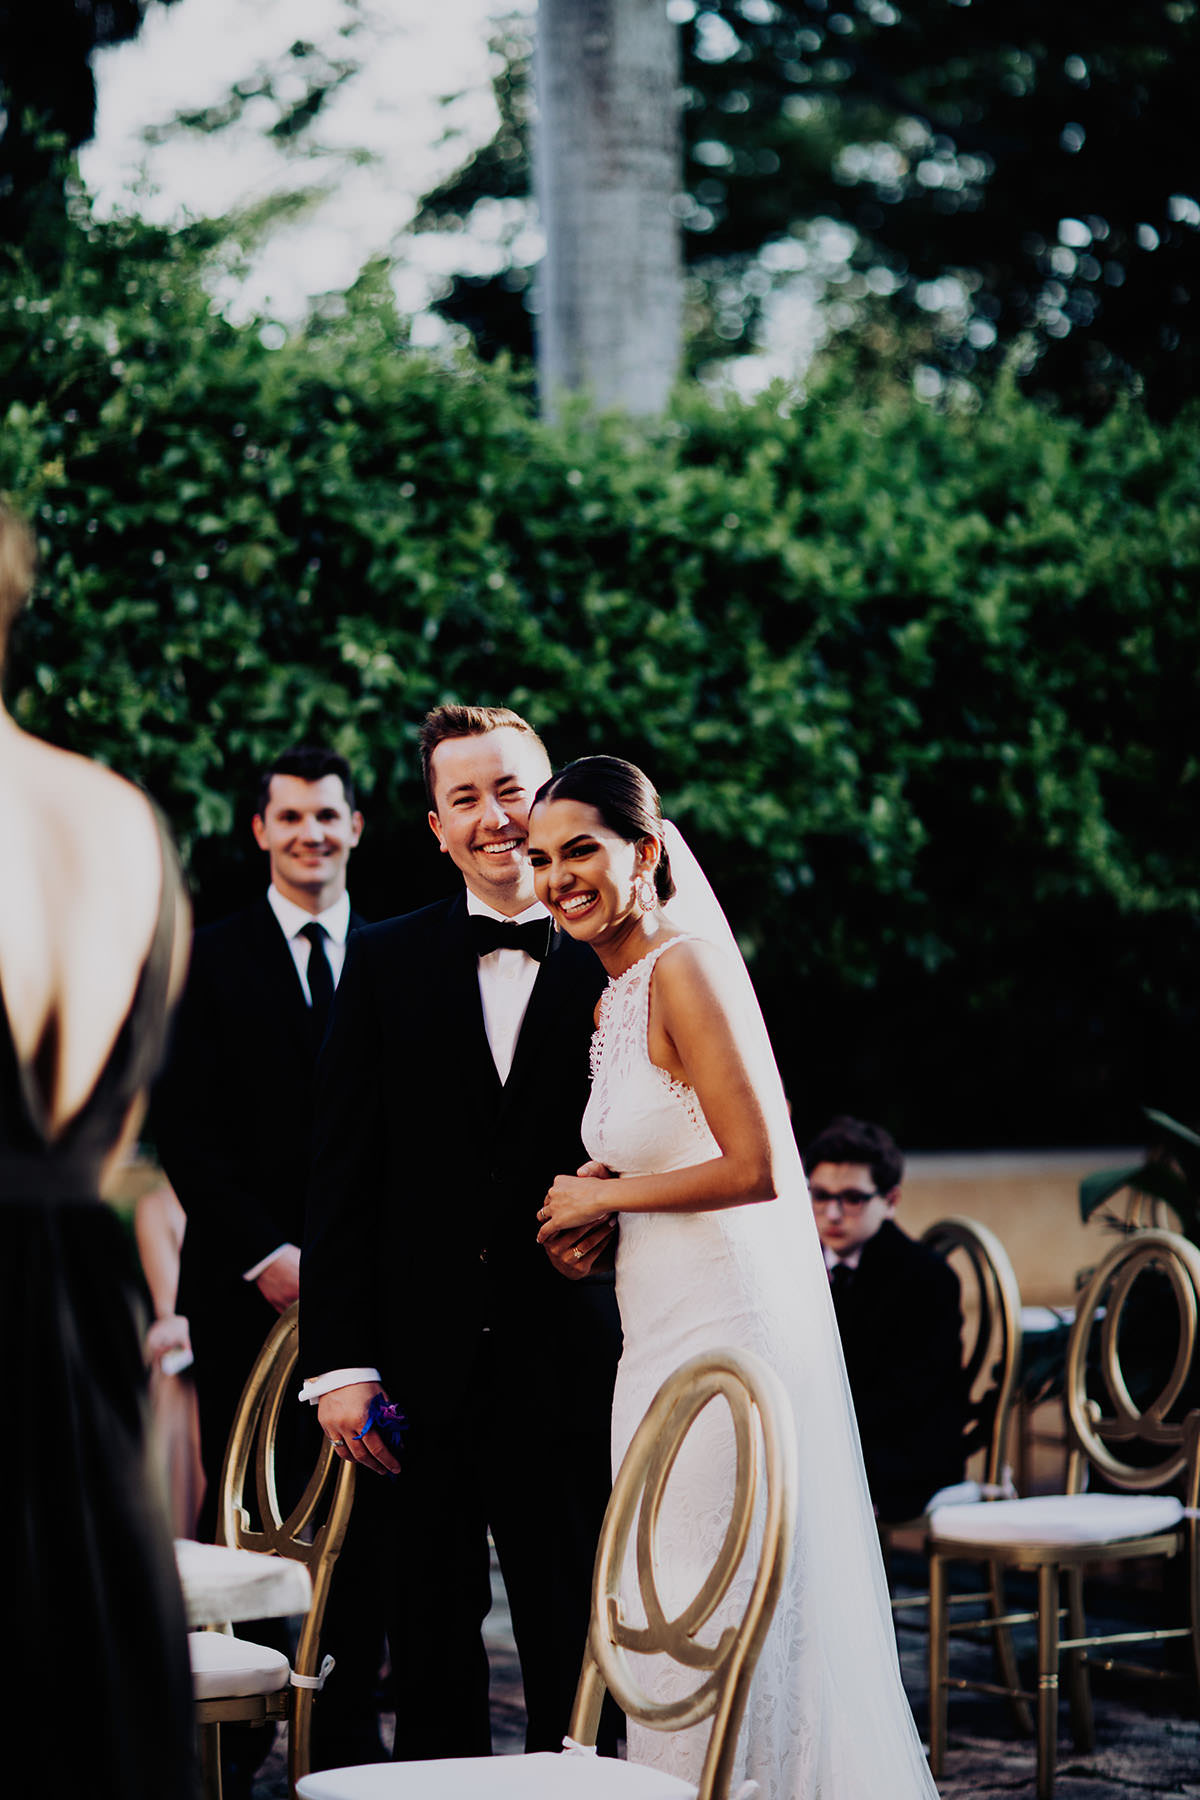 destination-wedding-photographer-la-hacienda-xcanatun-merida-mexico-126.jpg